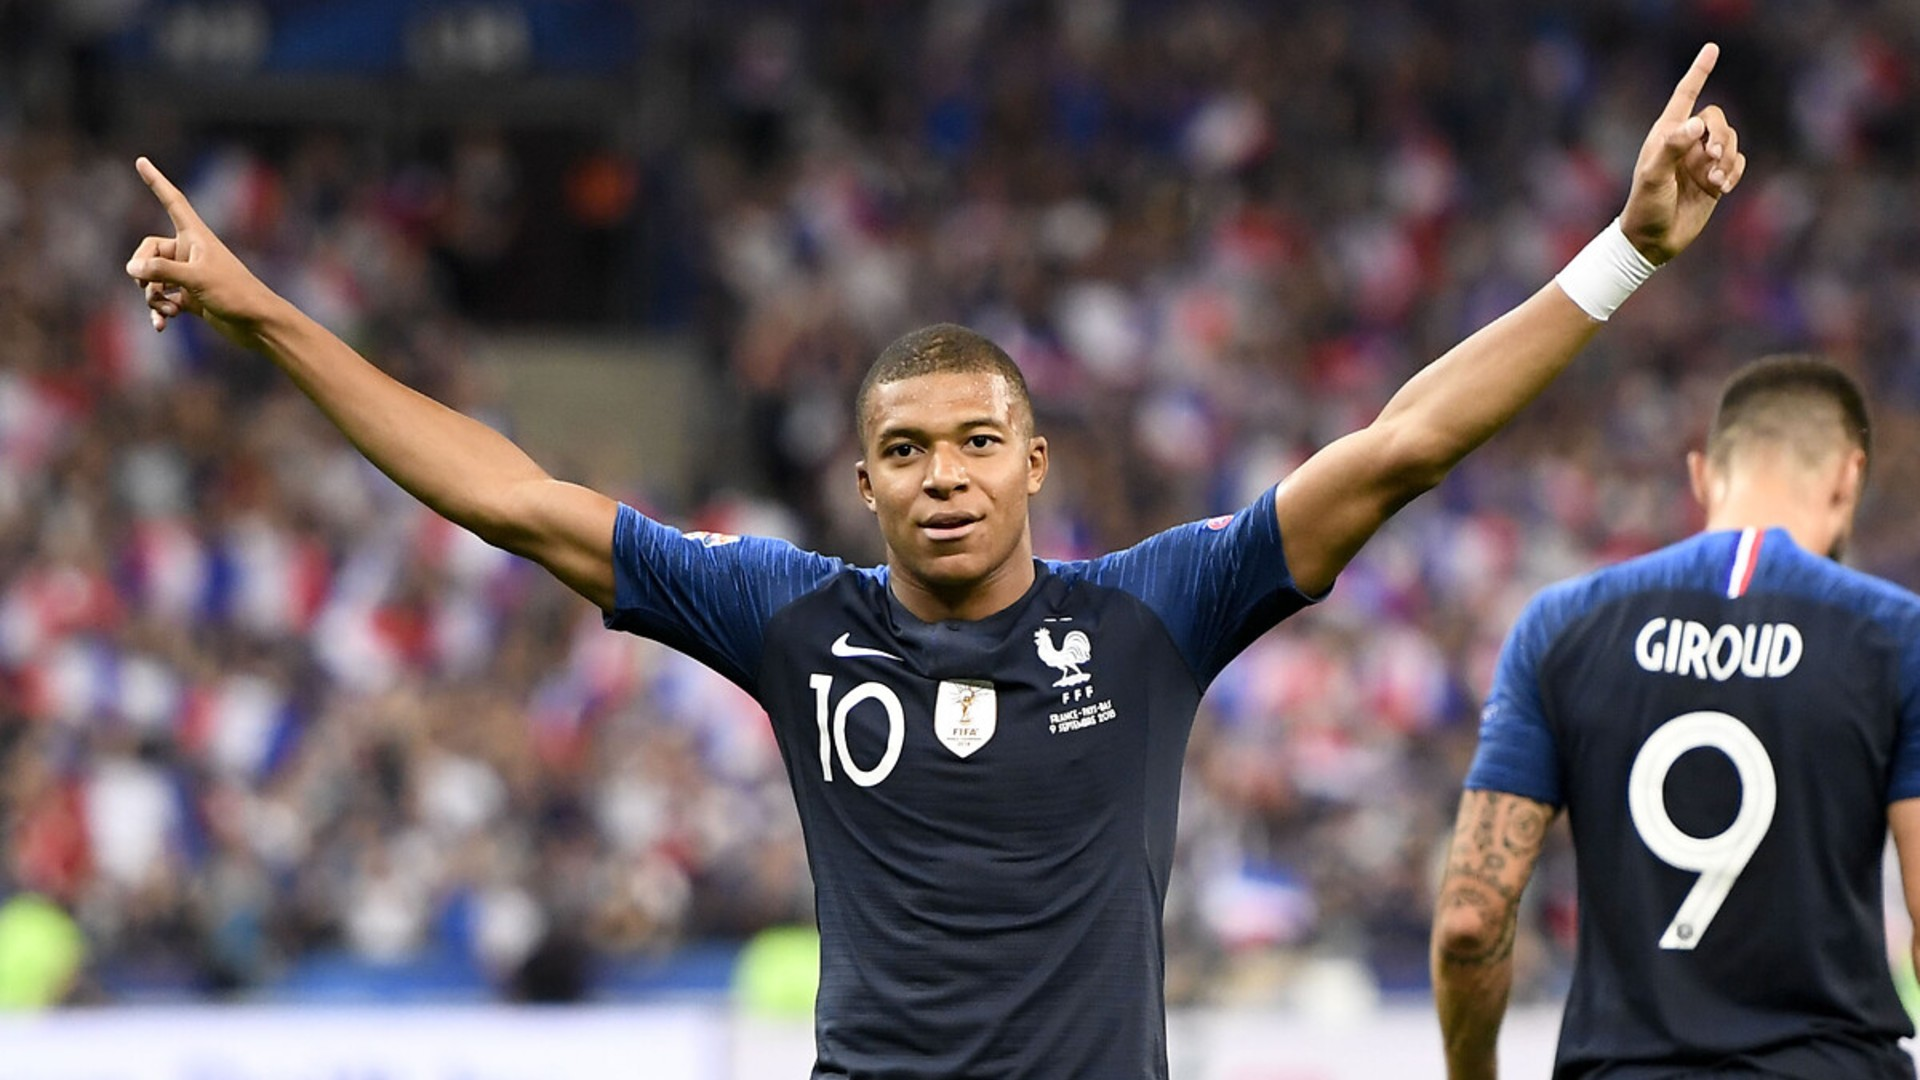 Kylian Mbappe Gol Sevinci Fransa 5 Mayıs 2021